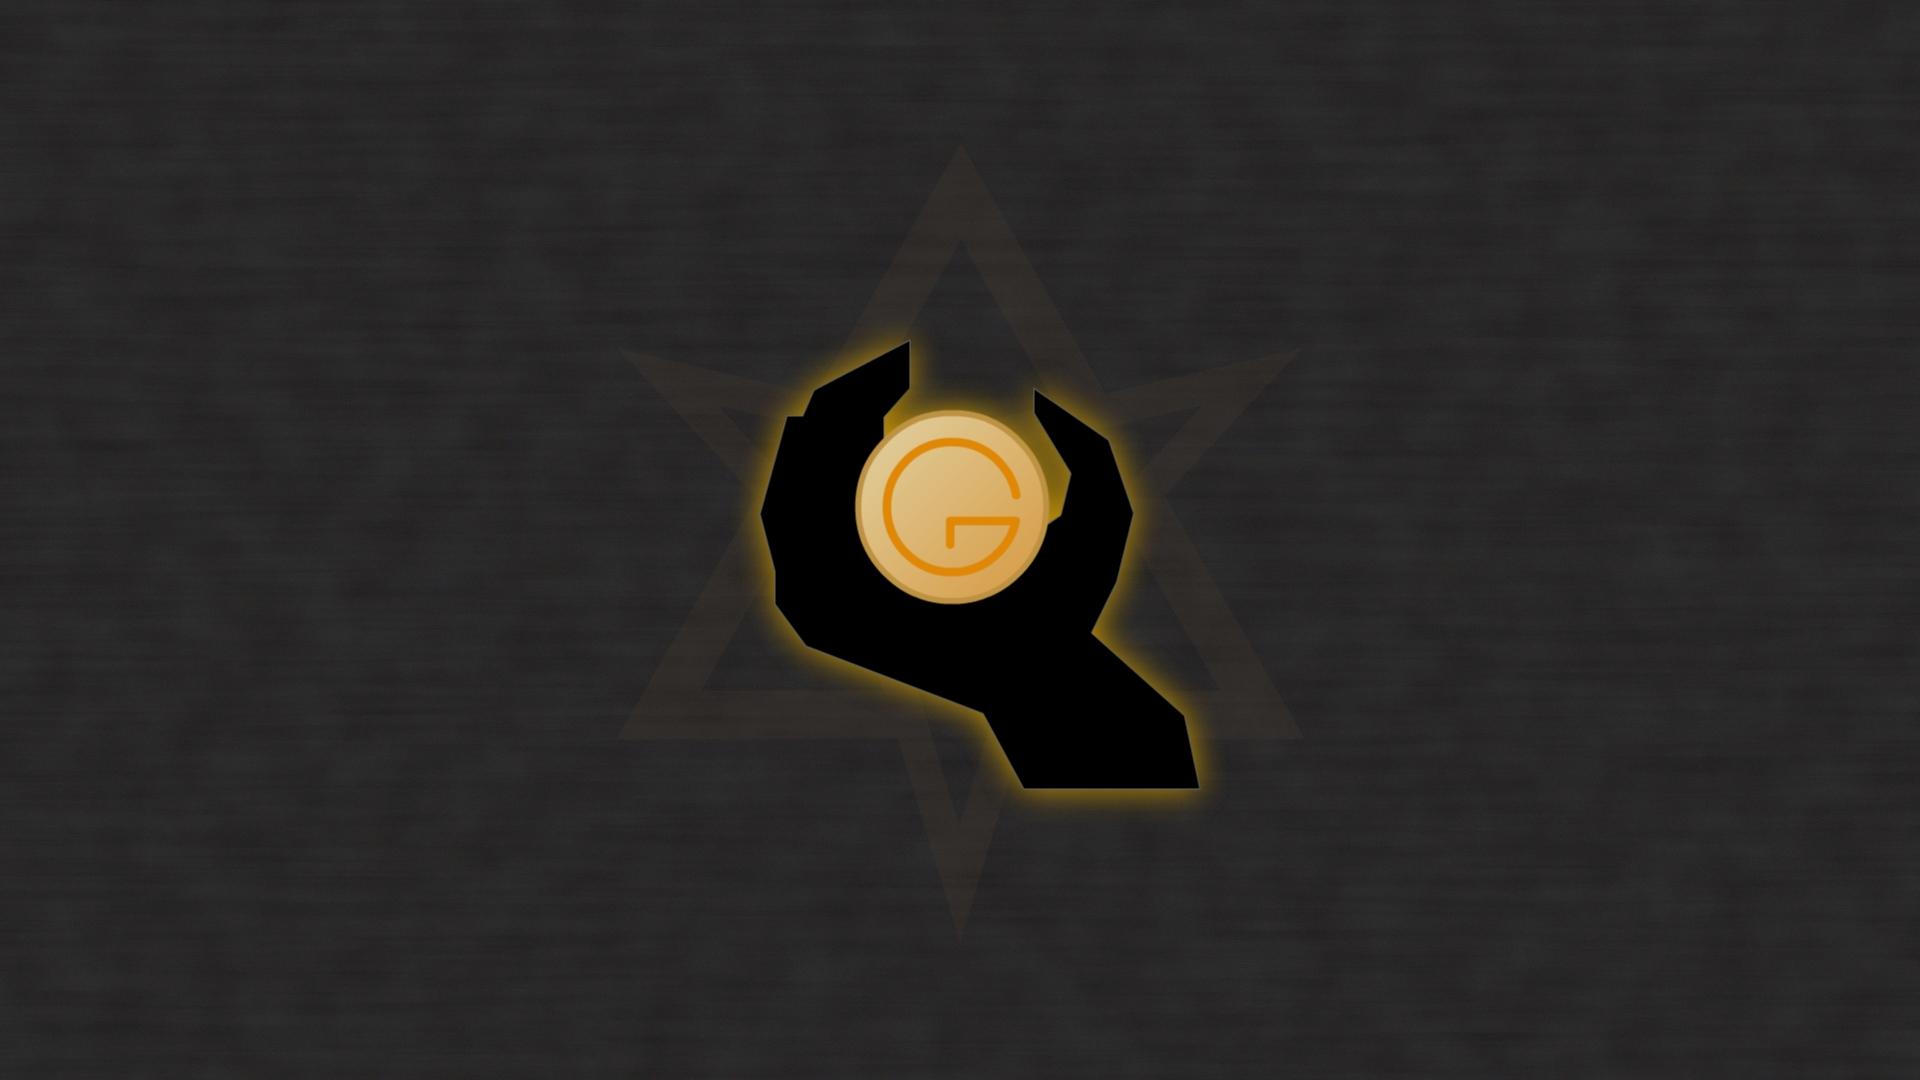 Icon for Phantom gold